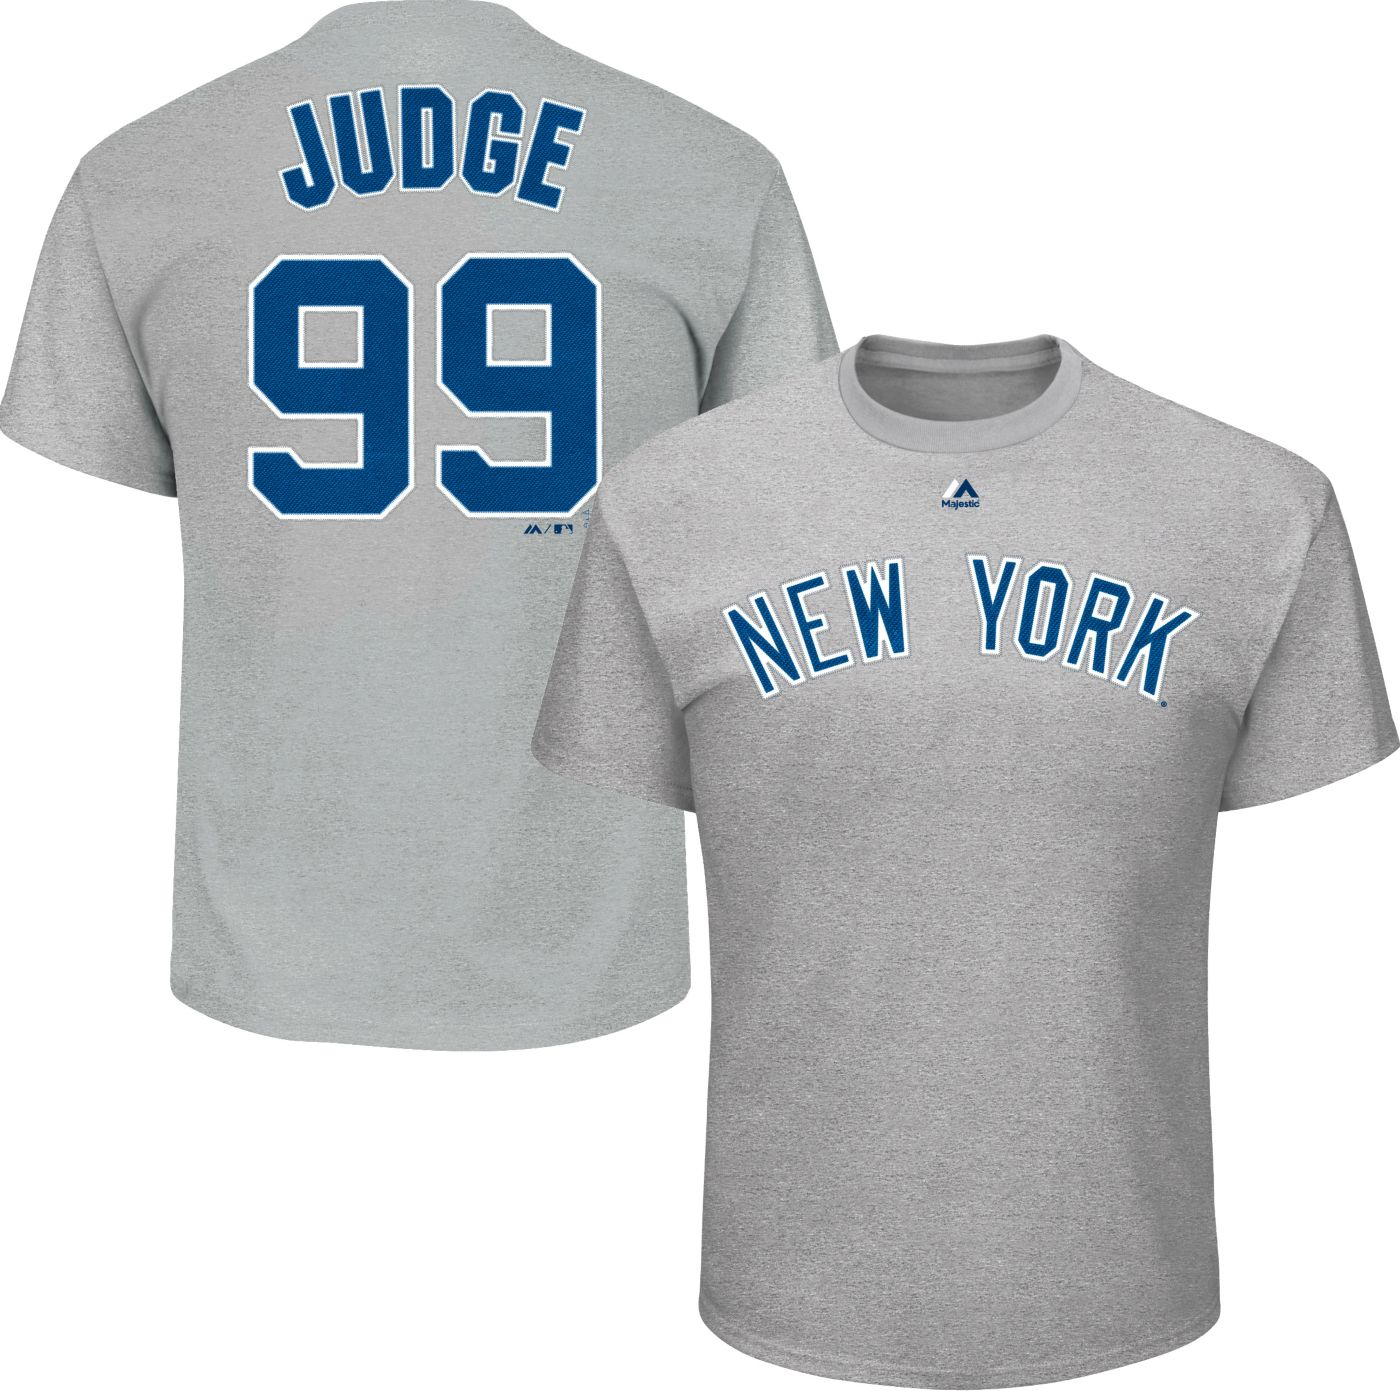 Majestic Youth New York Yankees Aaron Judge Grey T-Shirt